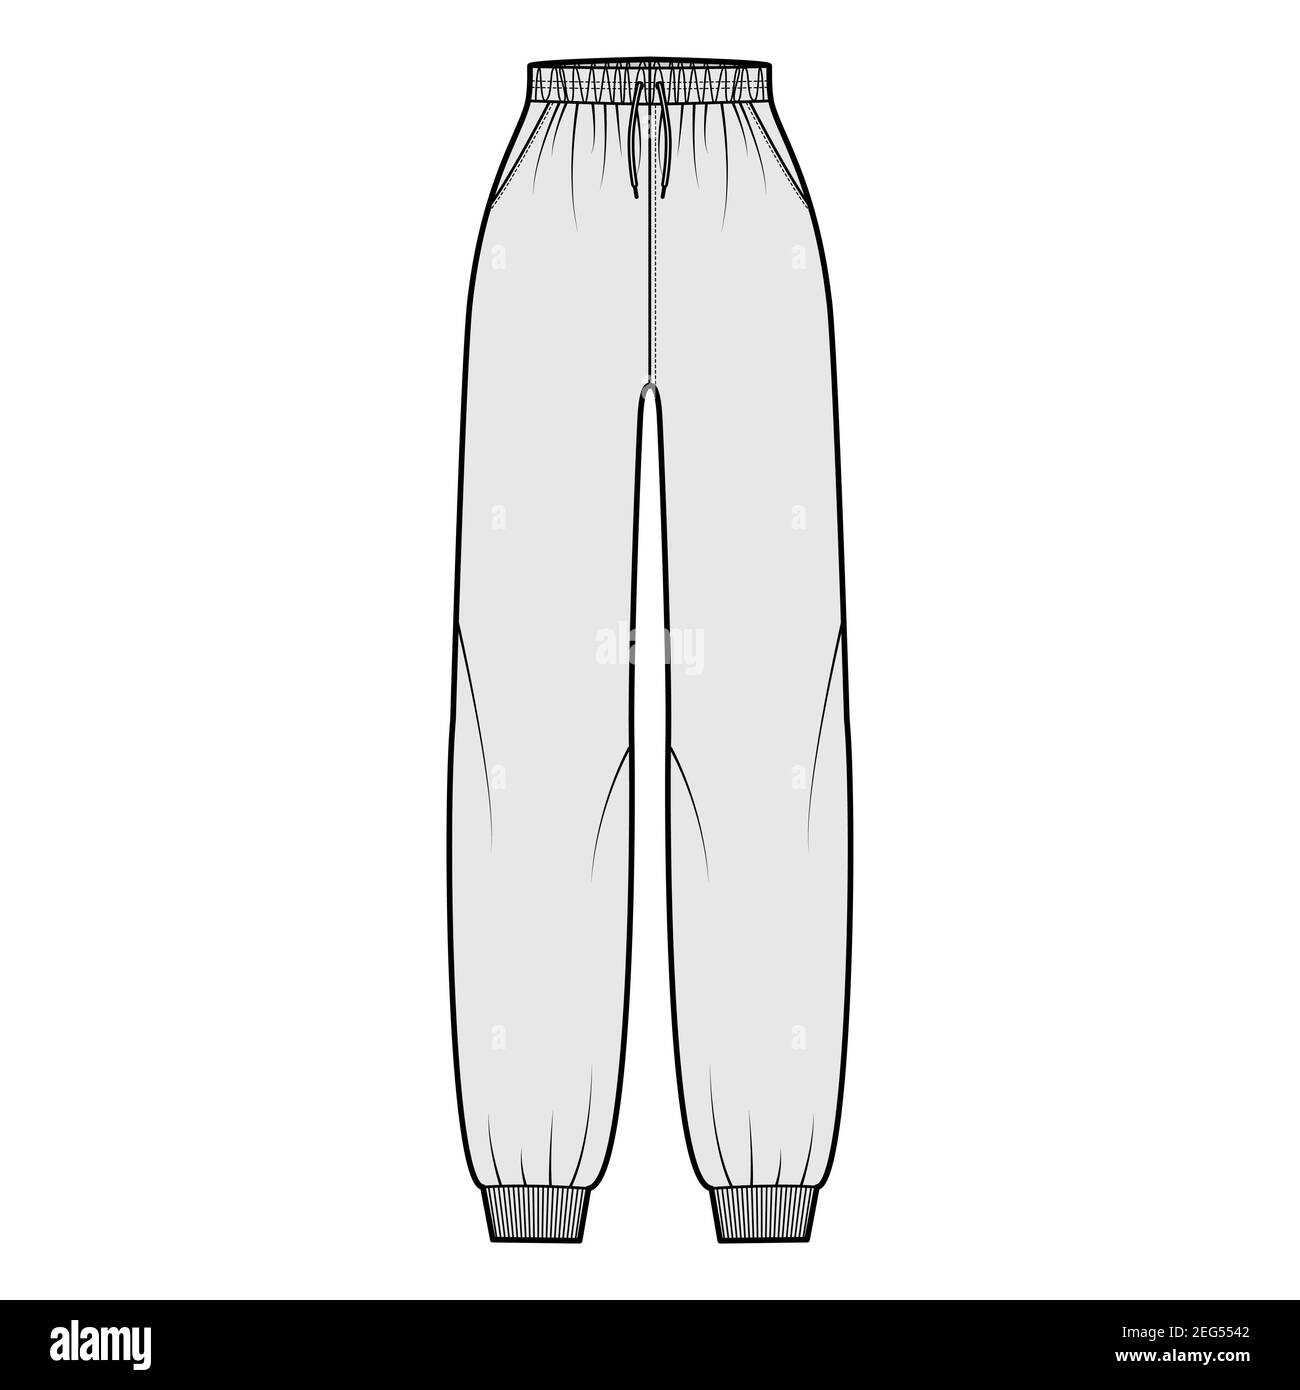 Pantalones Con Punos Fotos E Imagenes De Stock Alamy